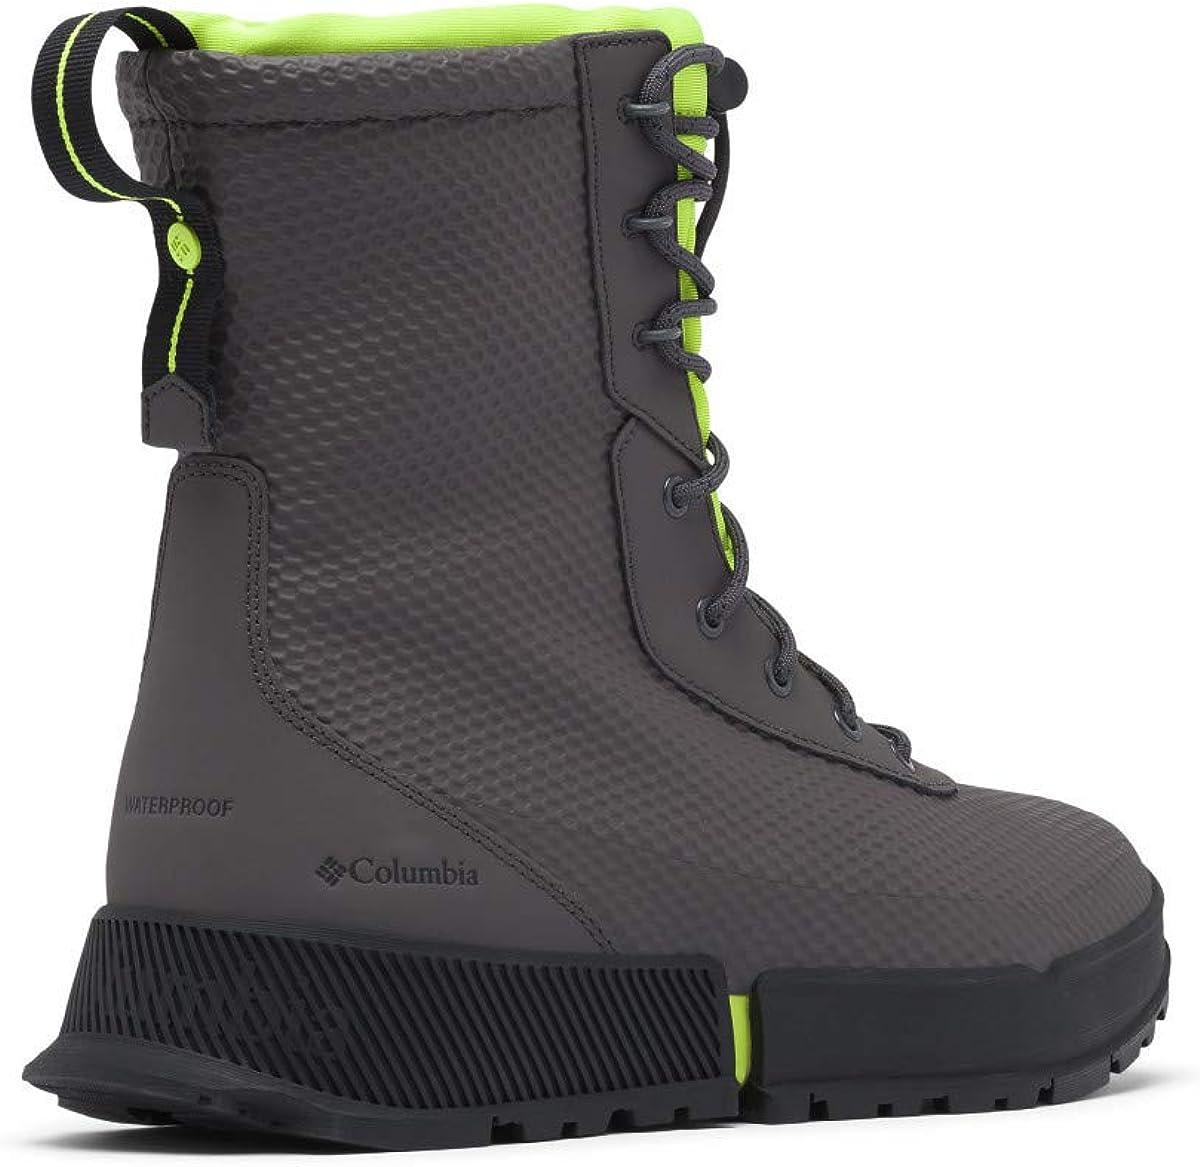 Columbia Mens Hyper-Boreal Omni-Heat Tall Snow Boot